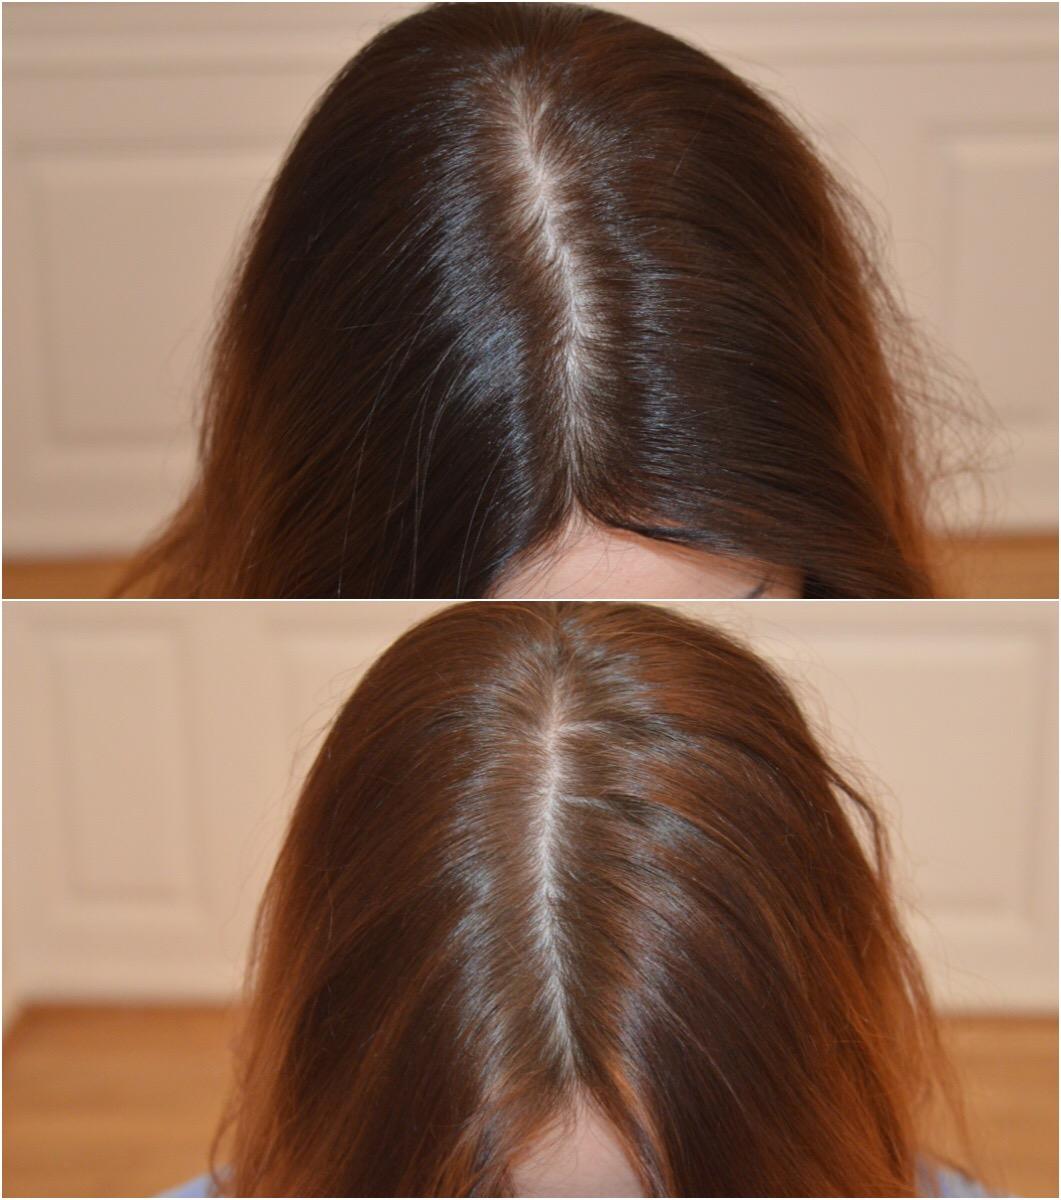 hårklinikken hårtab behandlingsforløb